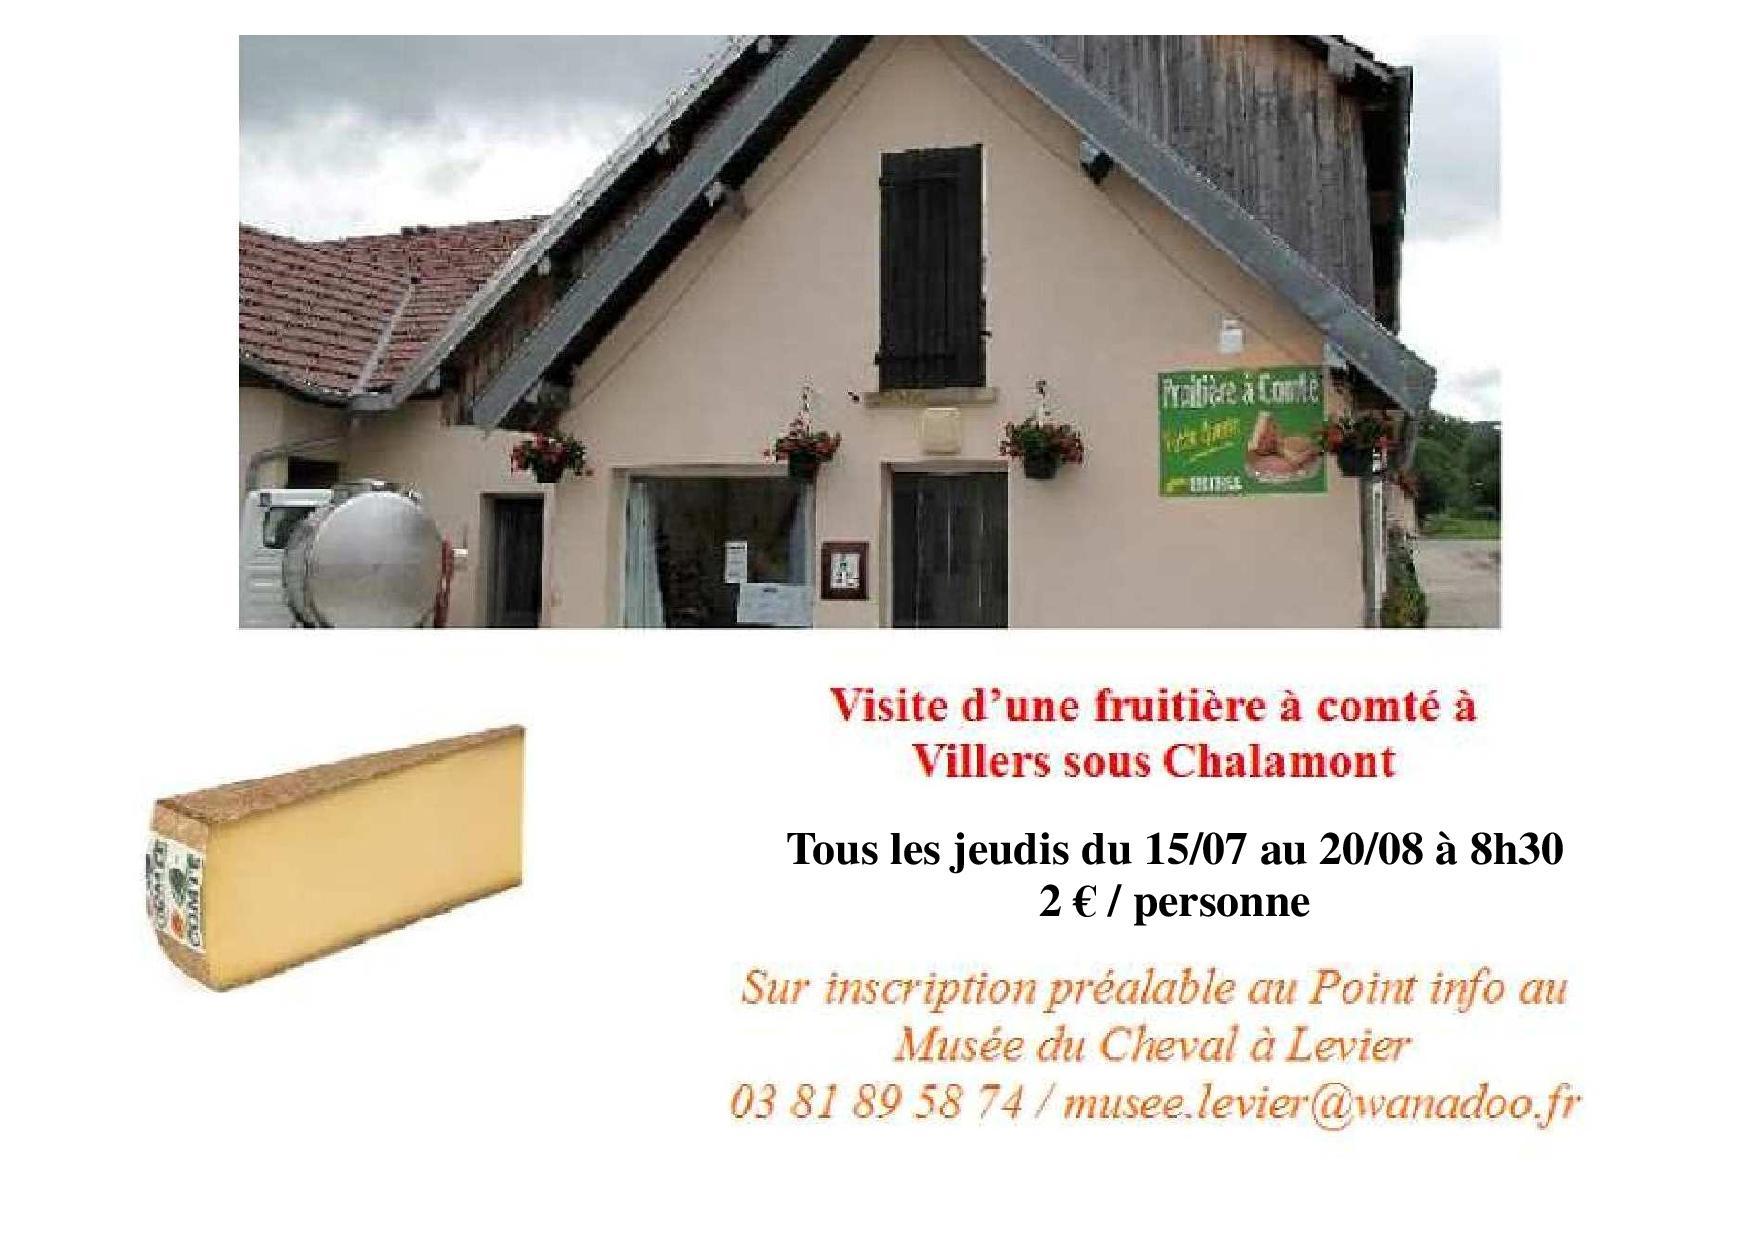 visite fruitière-page-001.jpg